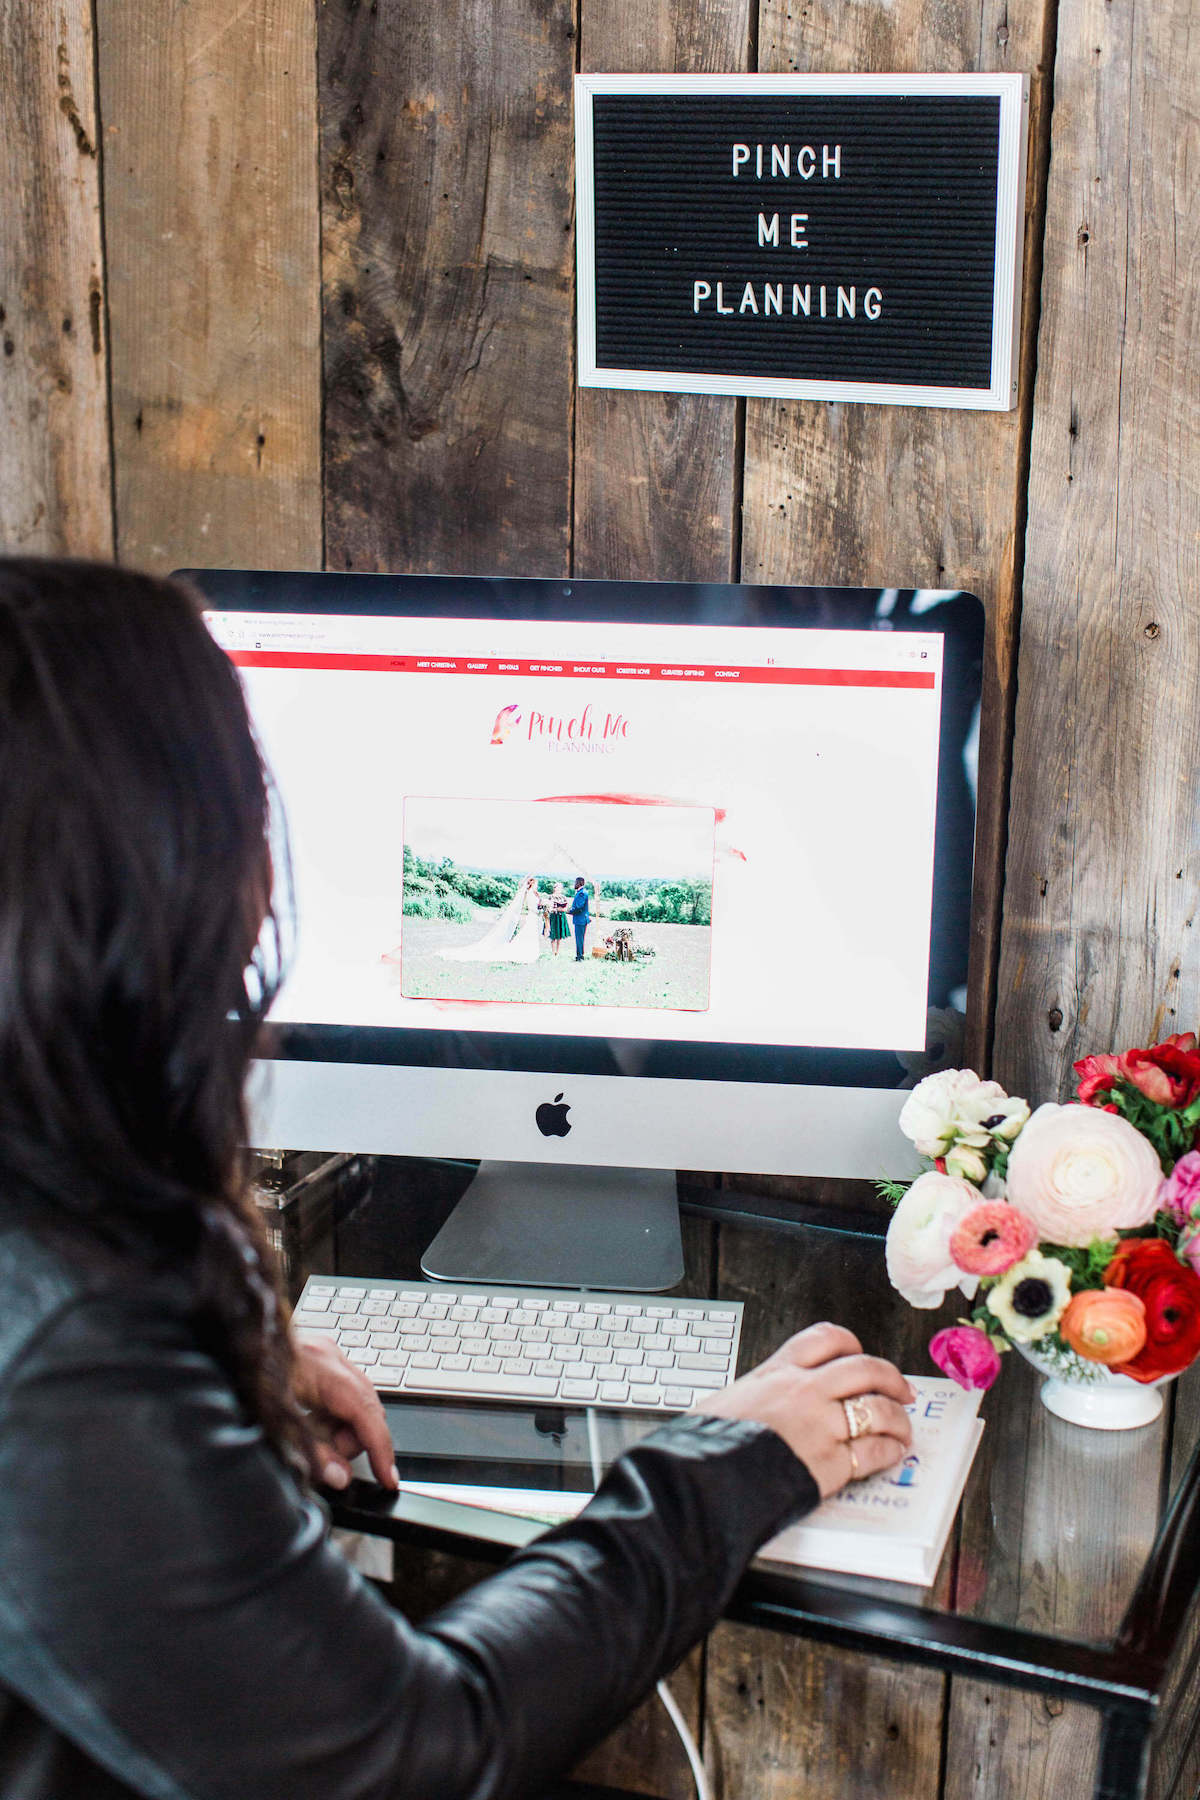 maine-wedding-planner-christina-padavano.jpg